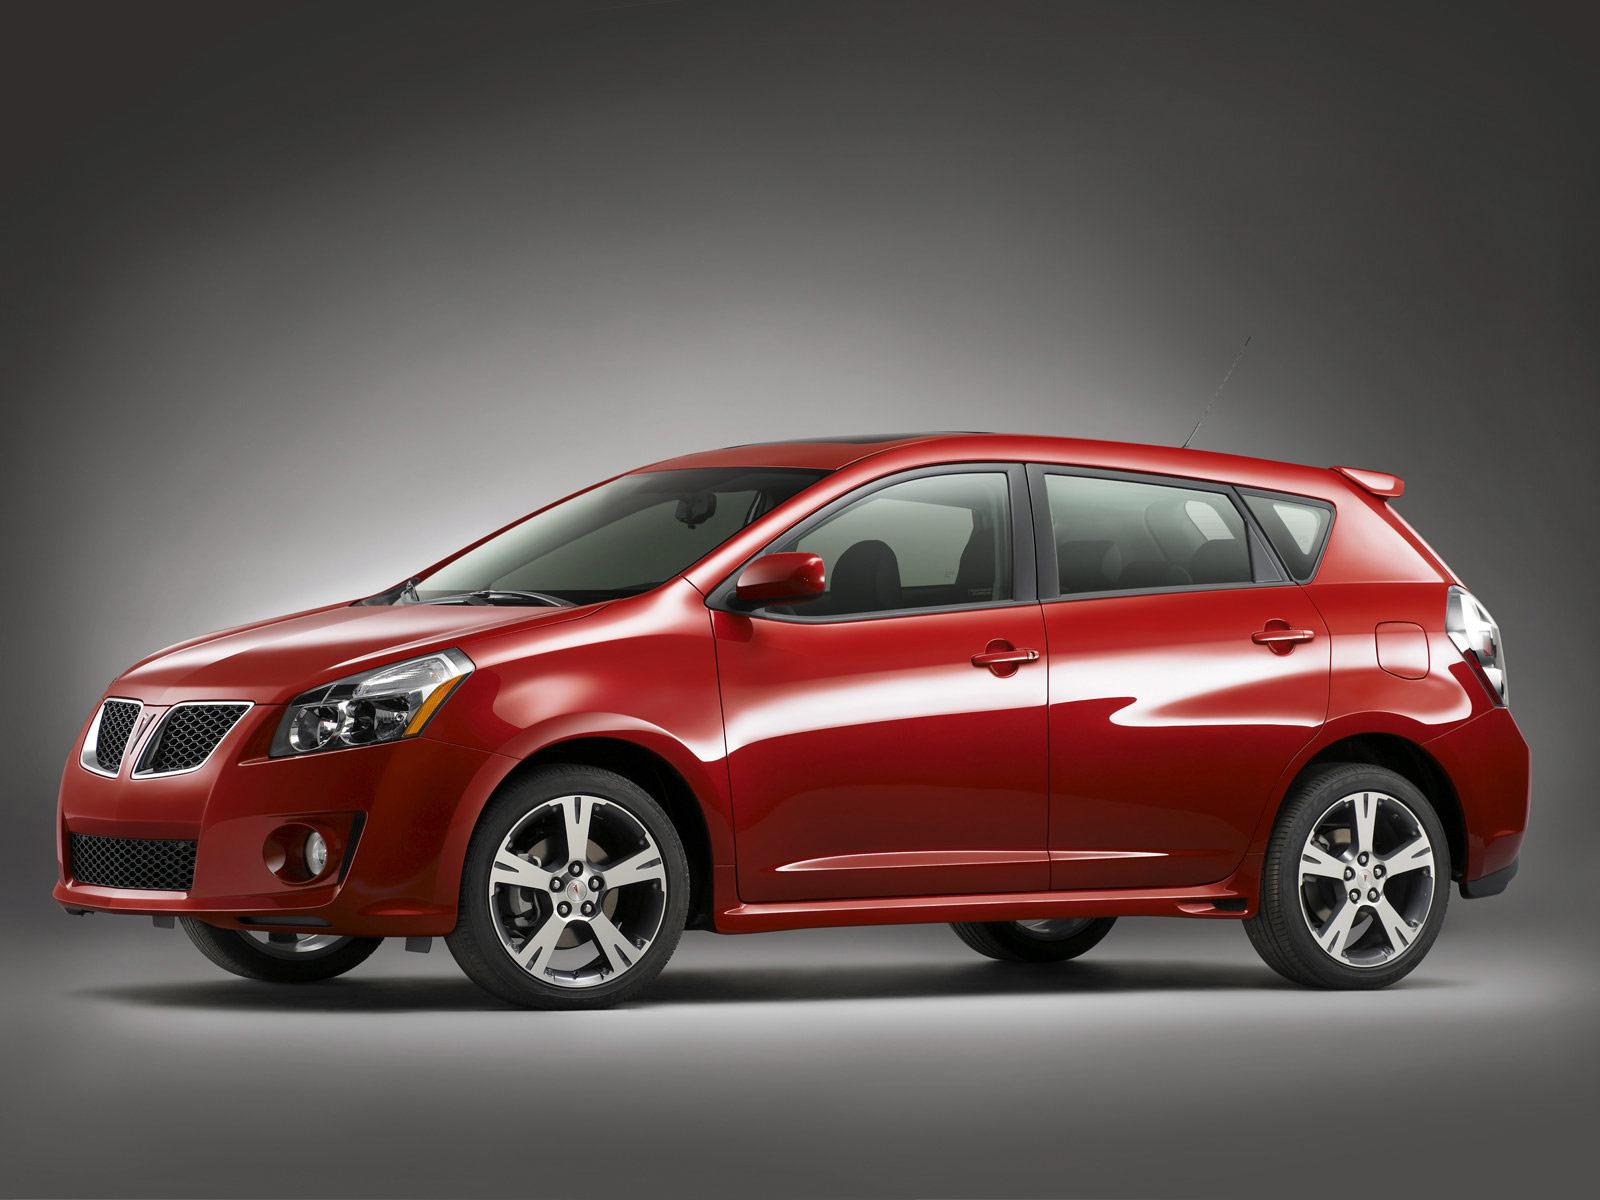 2009 Pontiac Vibe Car Desktop Wallpaper